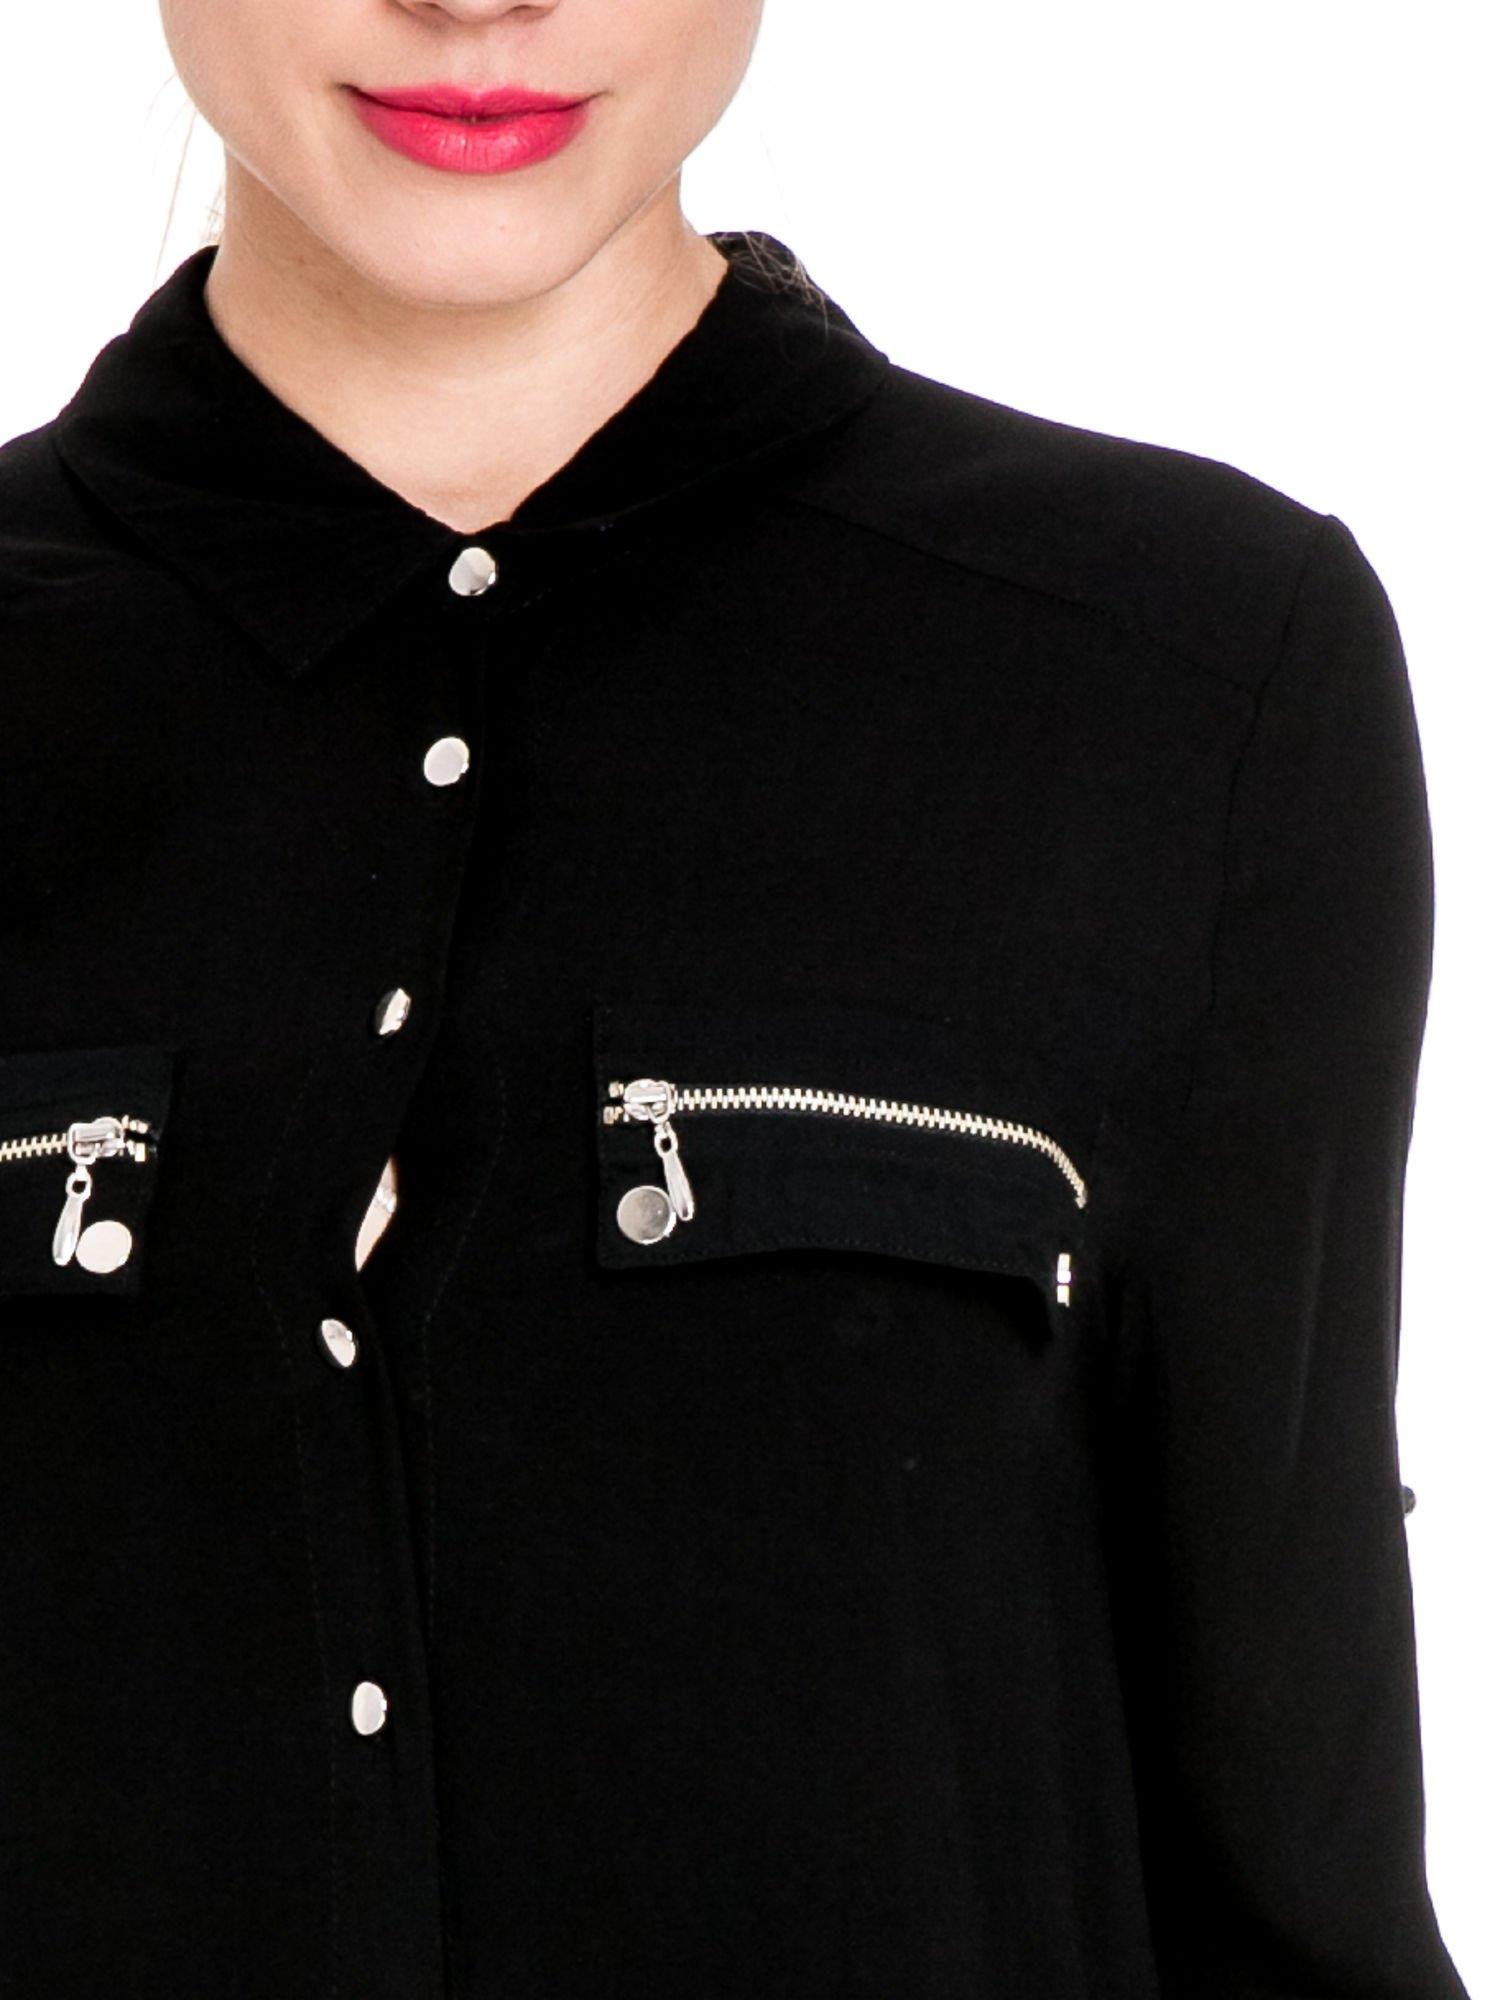 Czarna elegancka koszula z suwakami i napami                                  zdj.                                  7